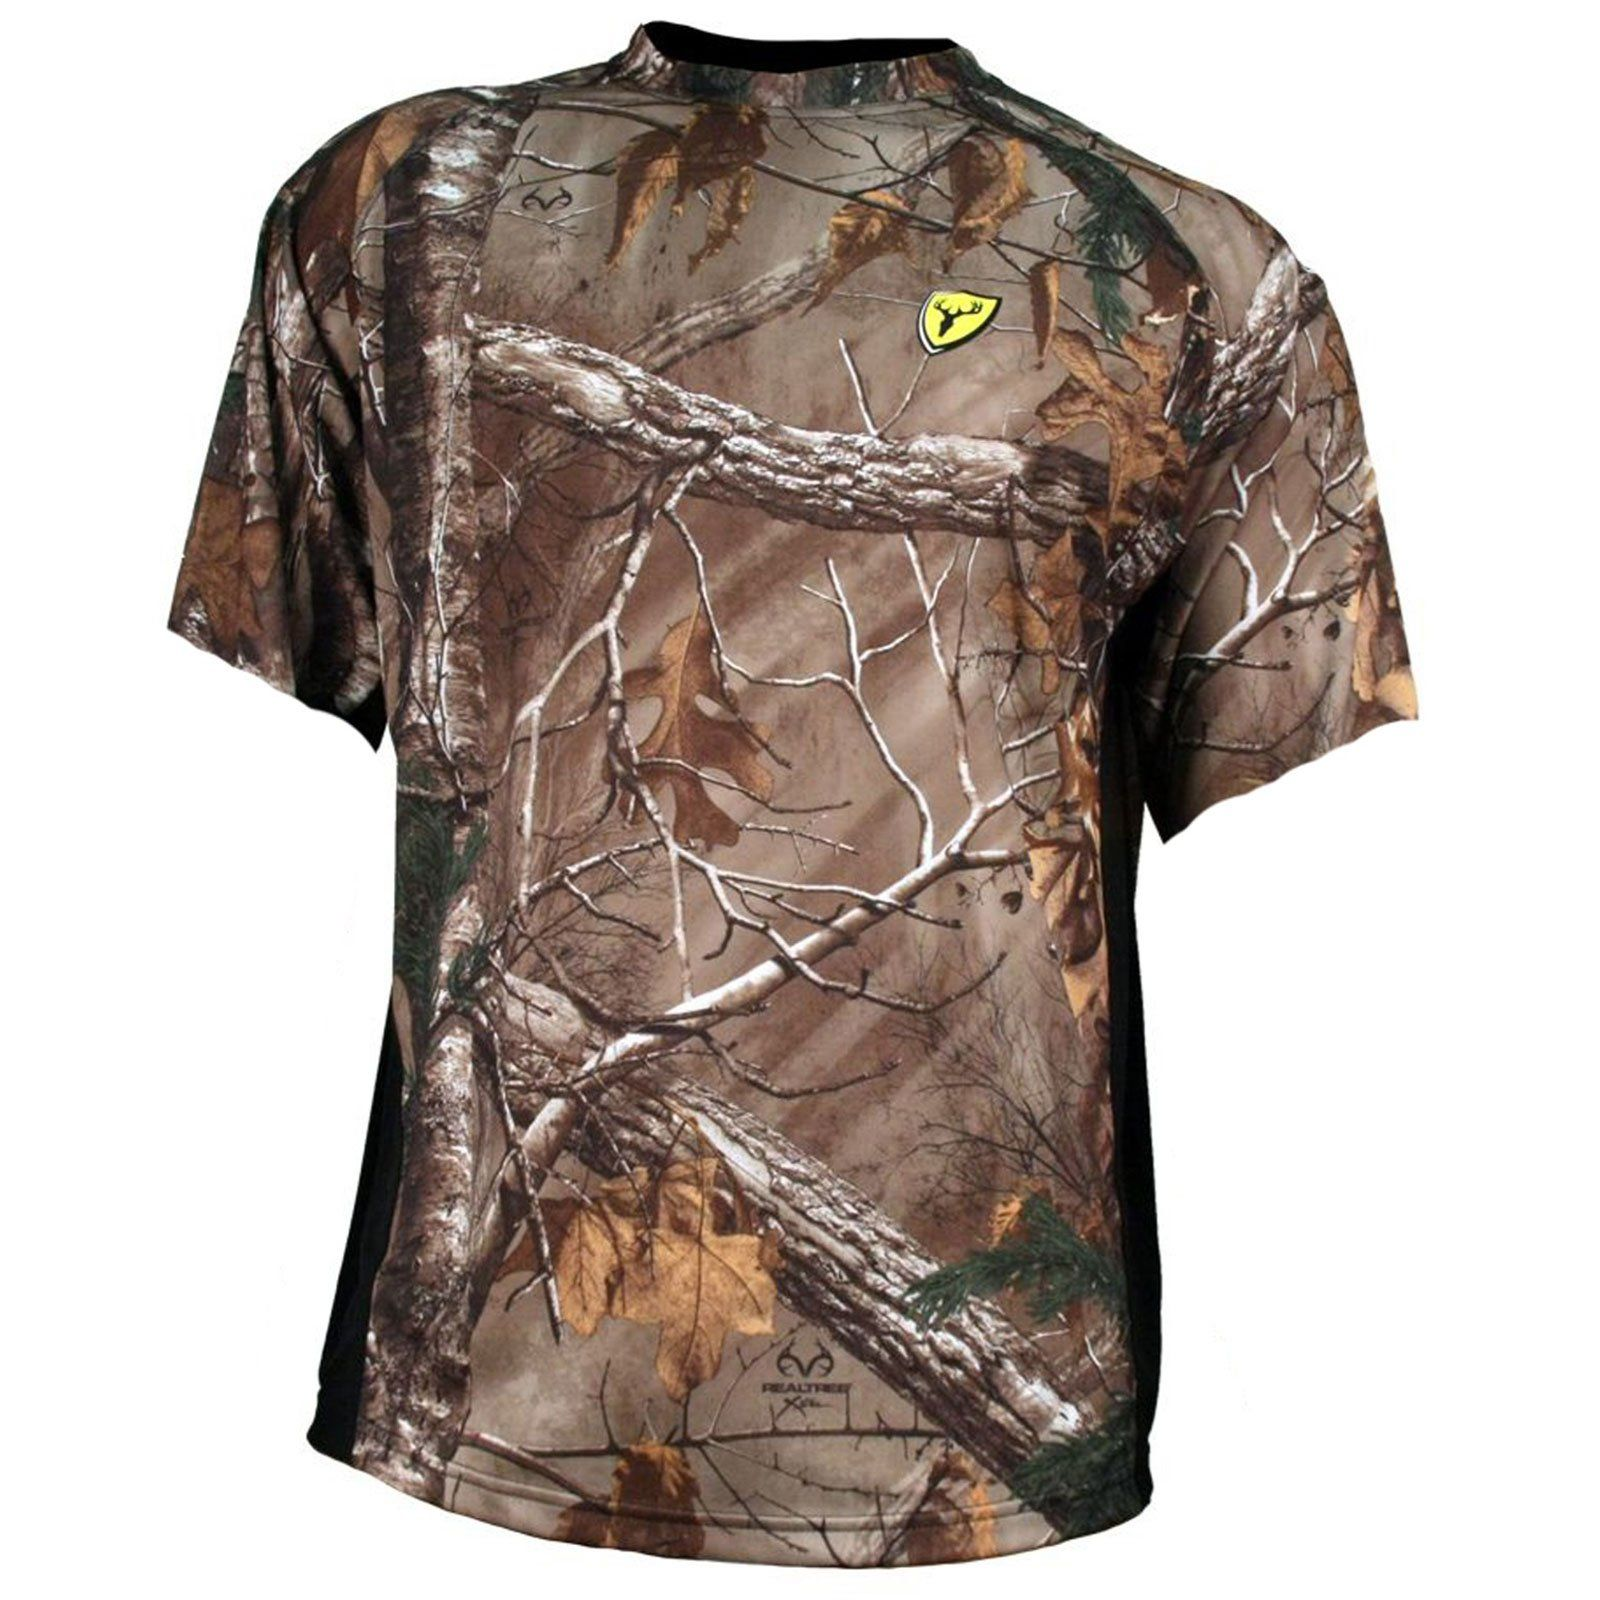 327111c8a ScentBlocker Men's 8th Layer Short Sleeve Shirt, Realtree Xtra, XX-Large.  Lightweight